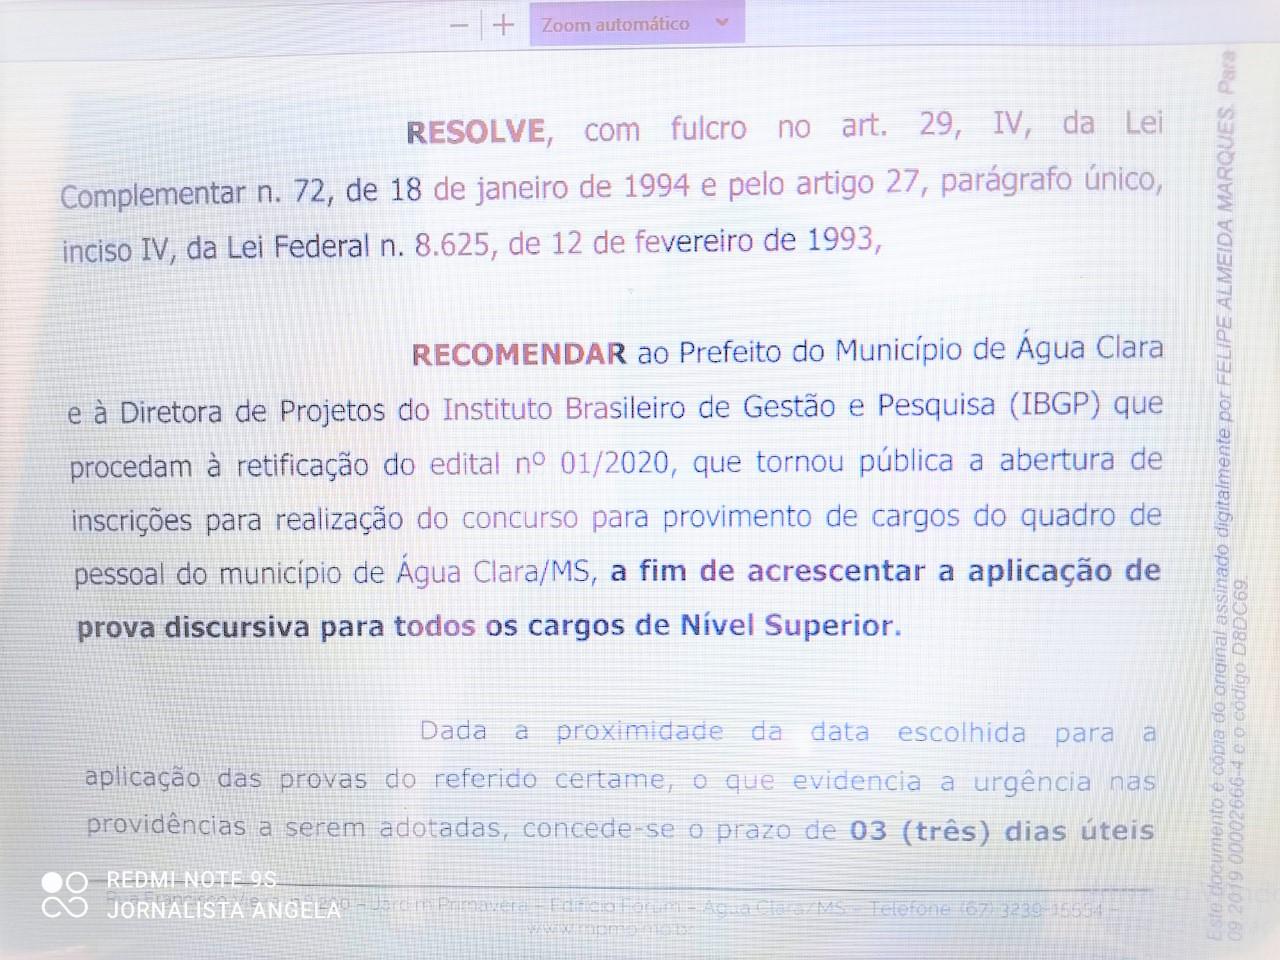 Concurso da Prefeitura: MP recomenda prova discursiva para todos os cargos de nível superior